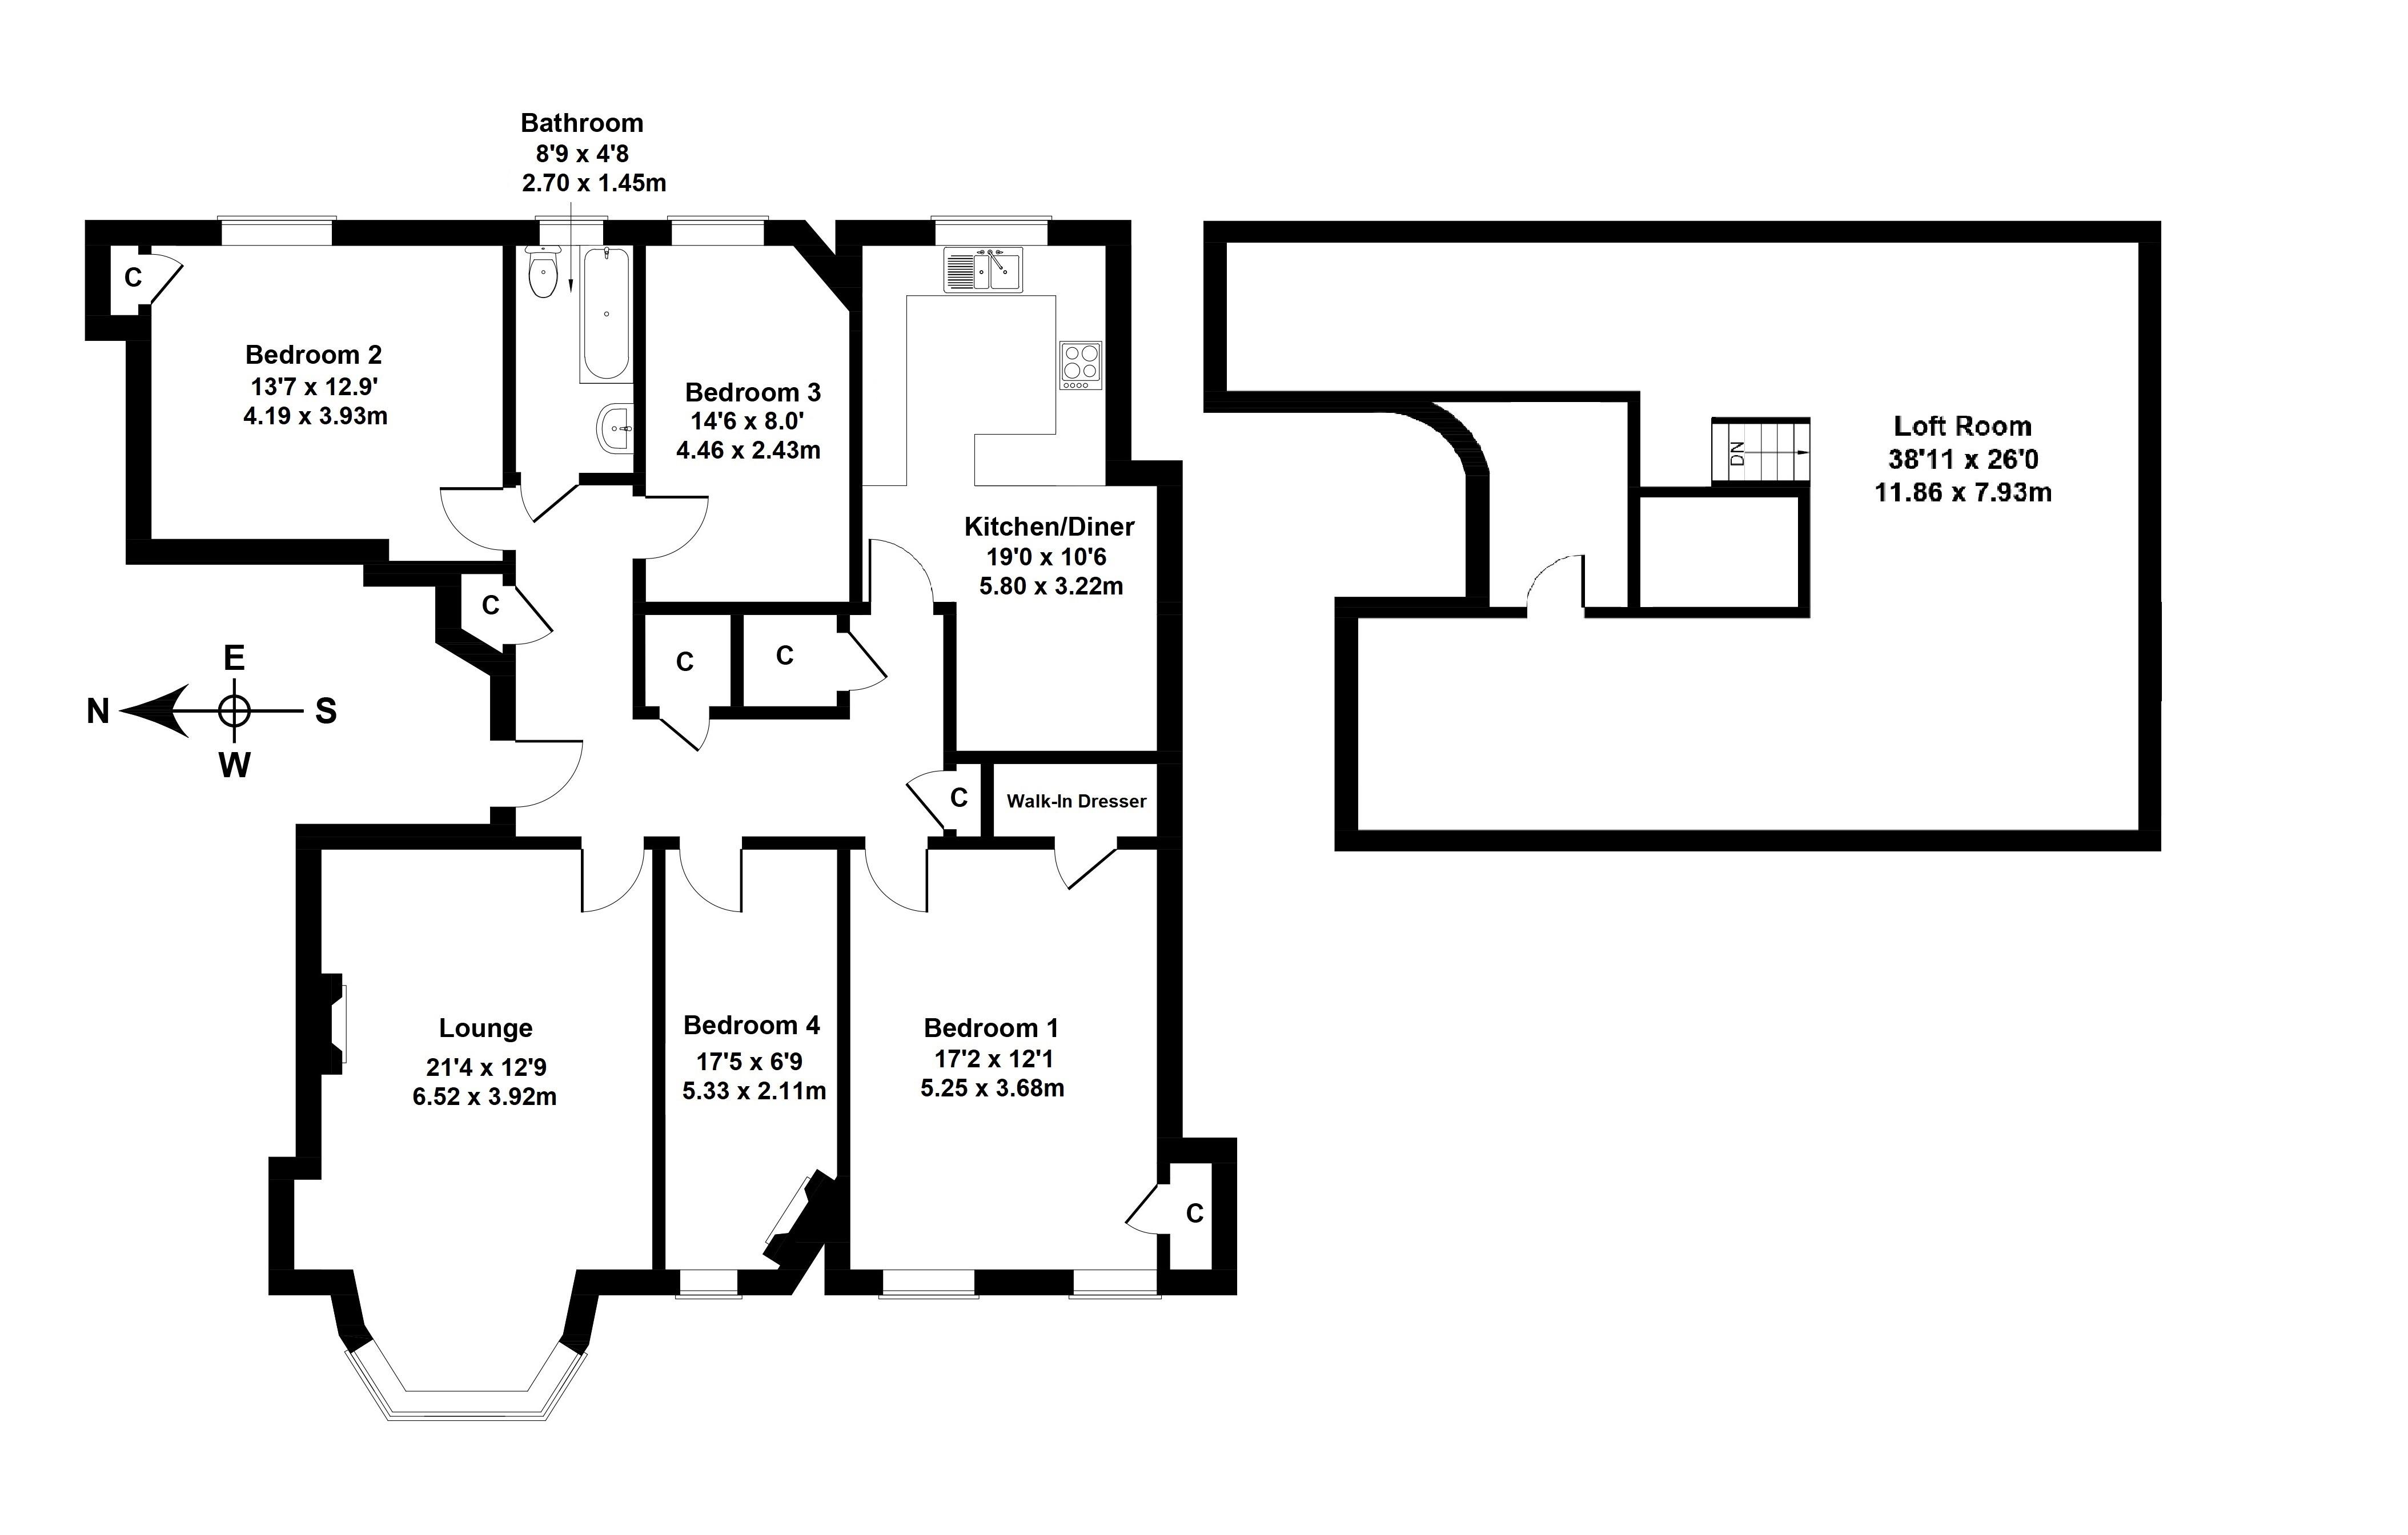 Floorplan 1 of 6/5, Woodburn Terrace, Morningside, Edinburgh, EH10 4SH